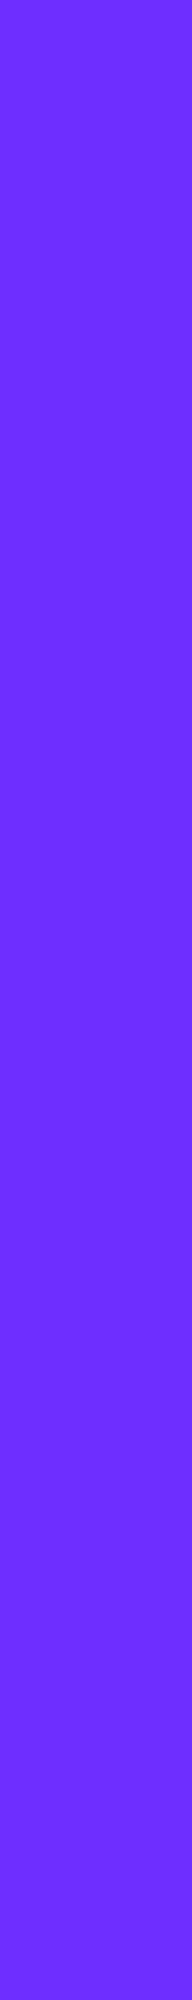 cromo48_#6d2eff